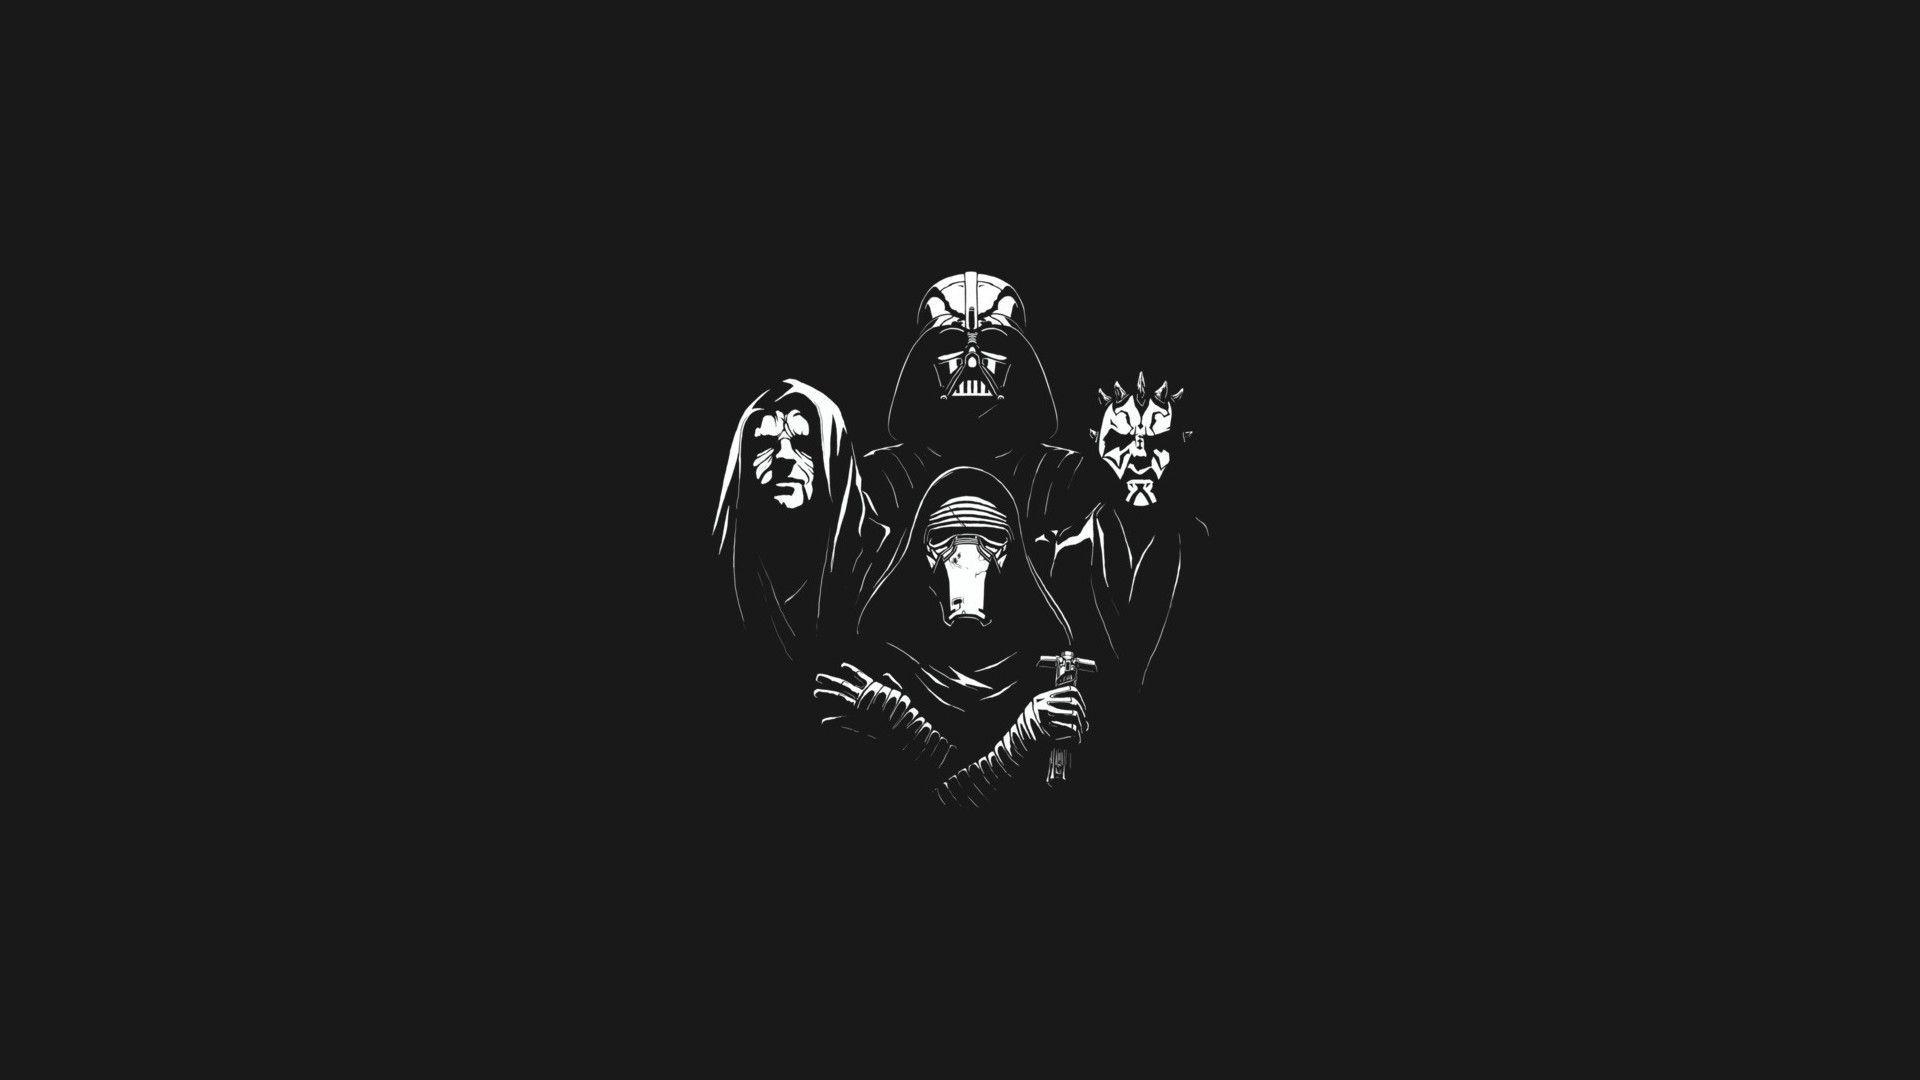 Dark Side Wallpapers Top Free Dark Side Backgrounds